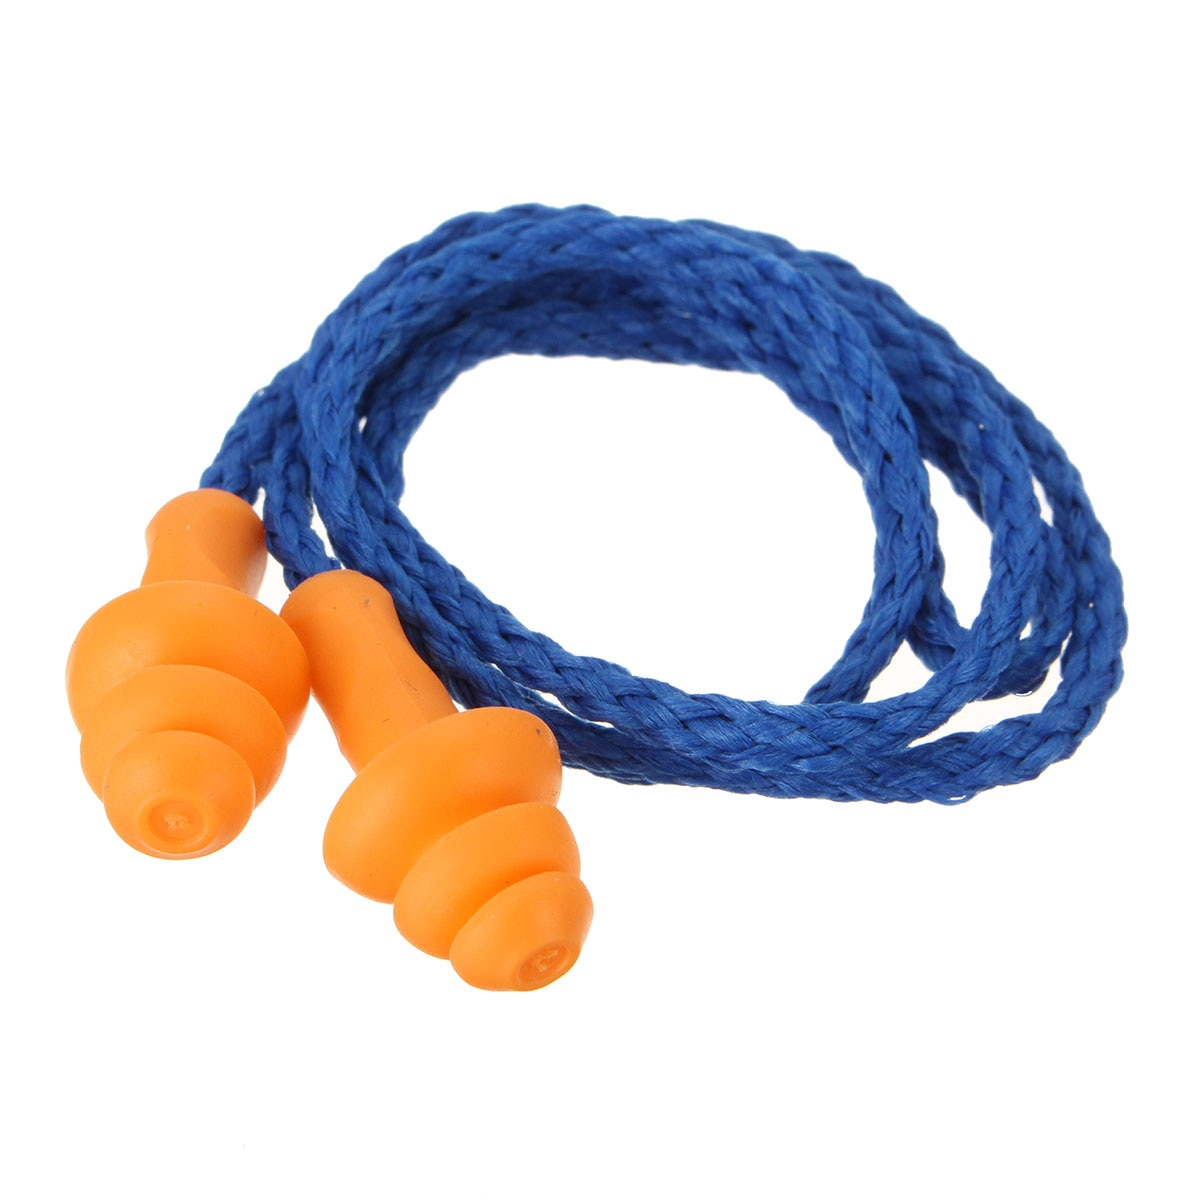 10Pcs/lot Soft Silicone Corded Ear Plugs ears Protector Reusable Hearing Protection Noise Reduction Earplugs Earmuff